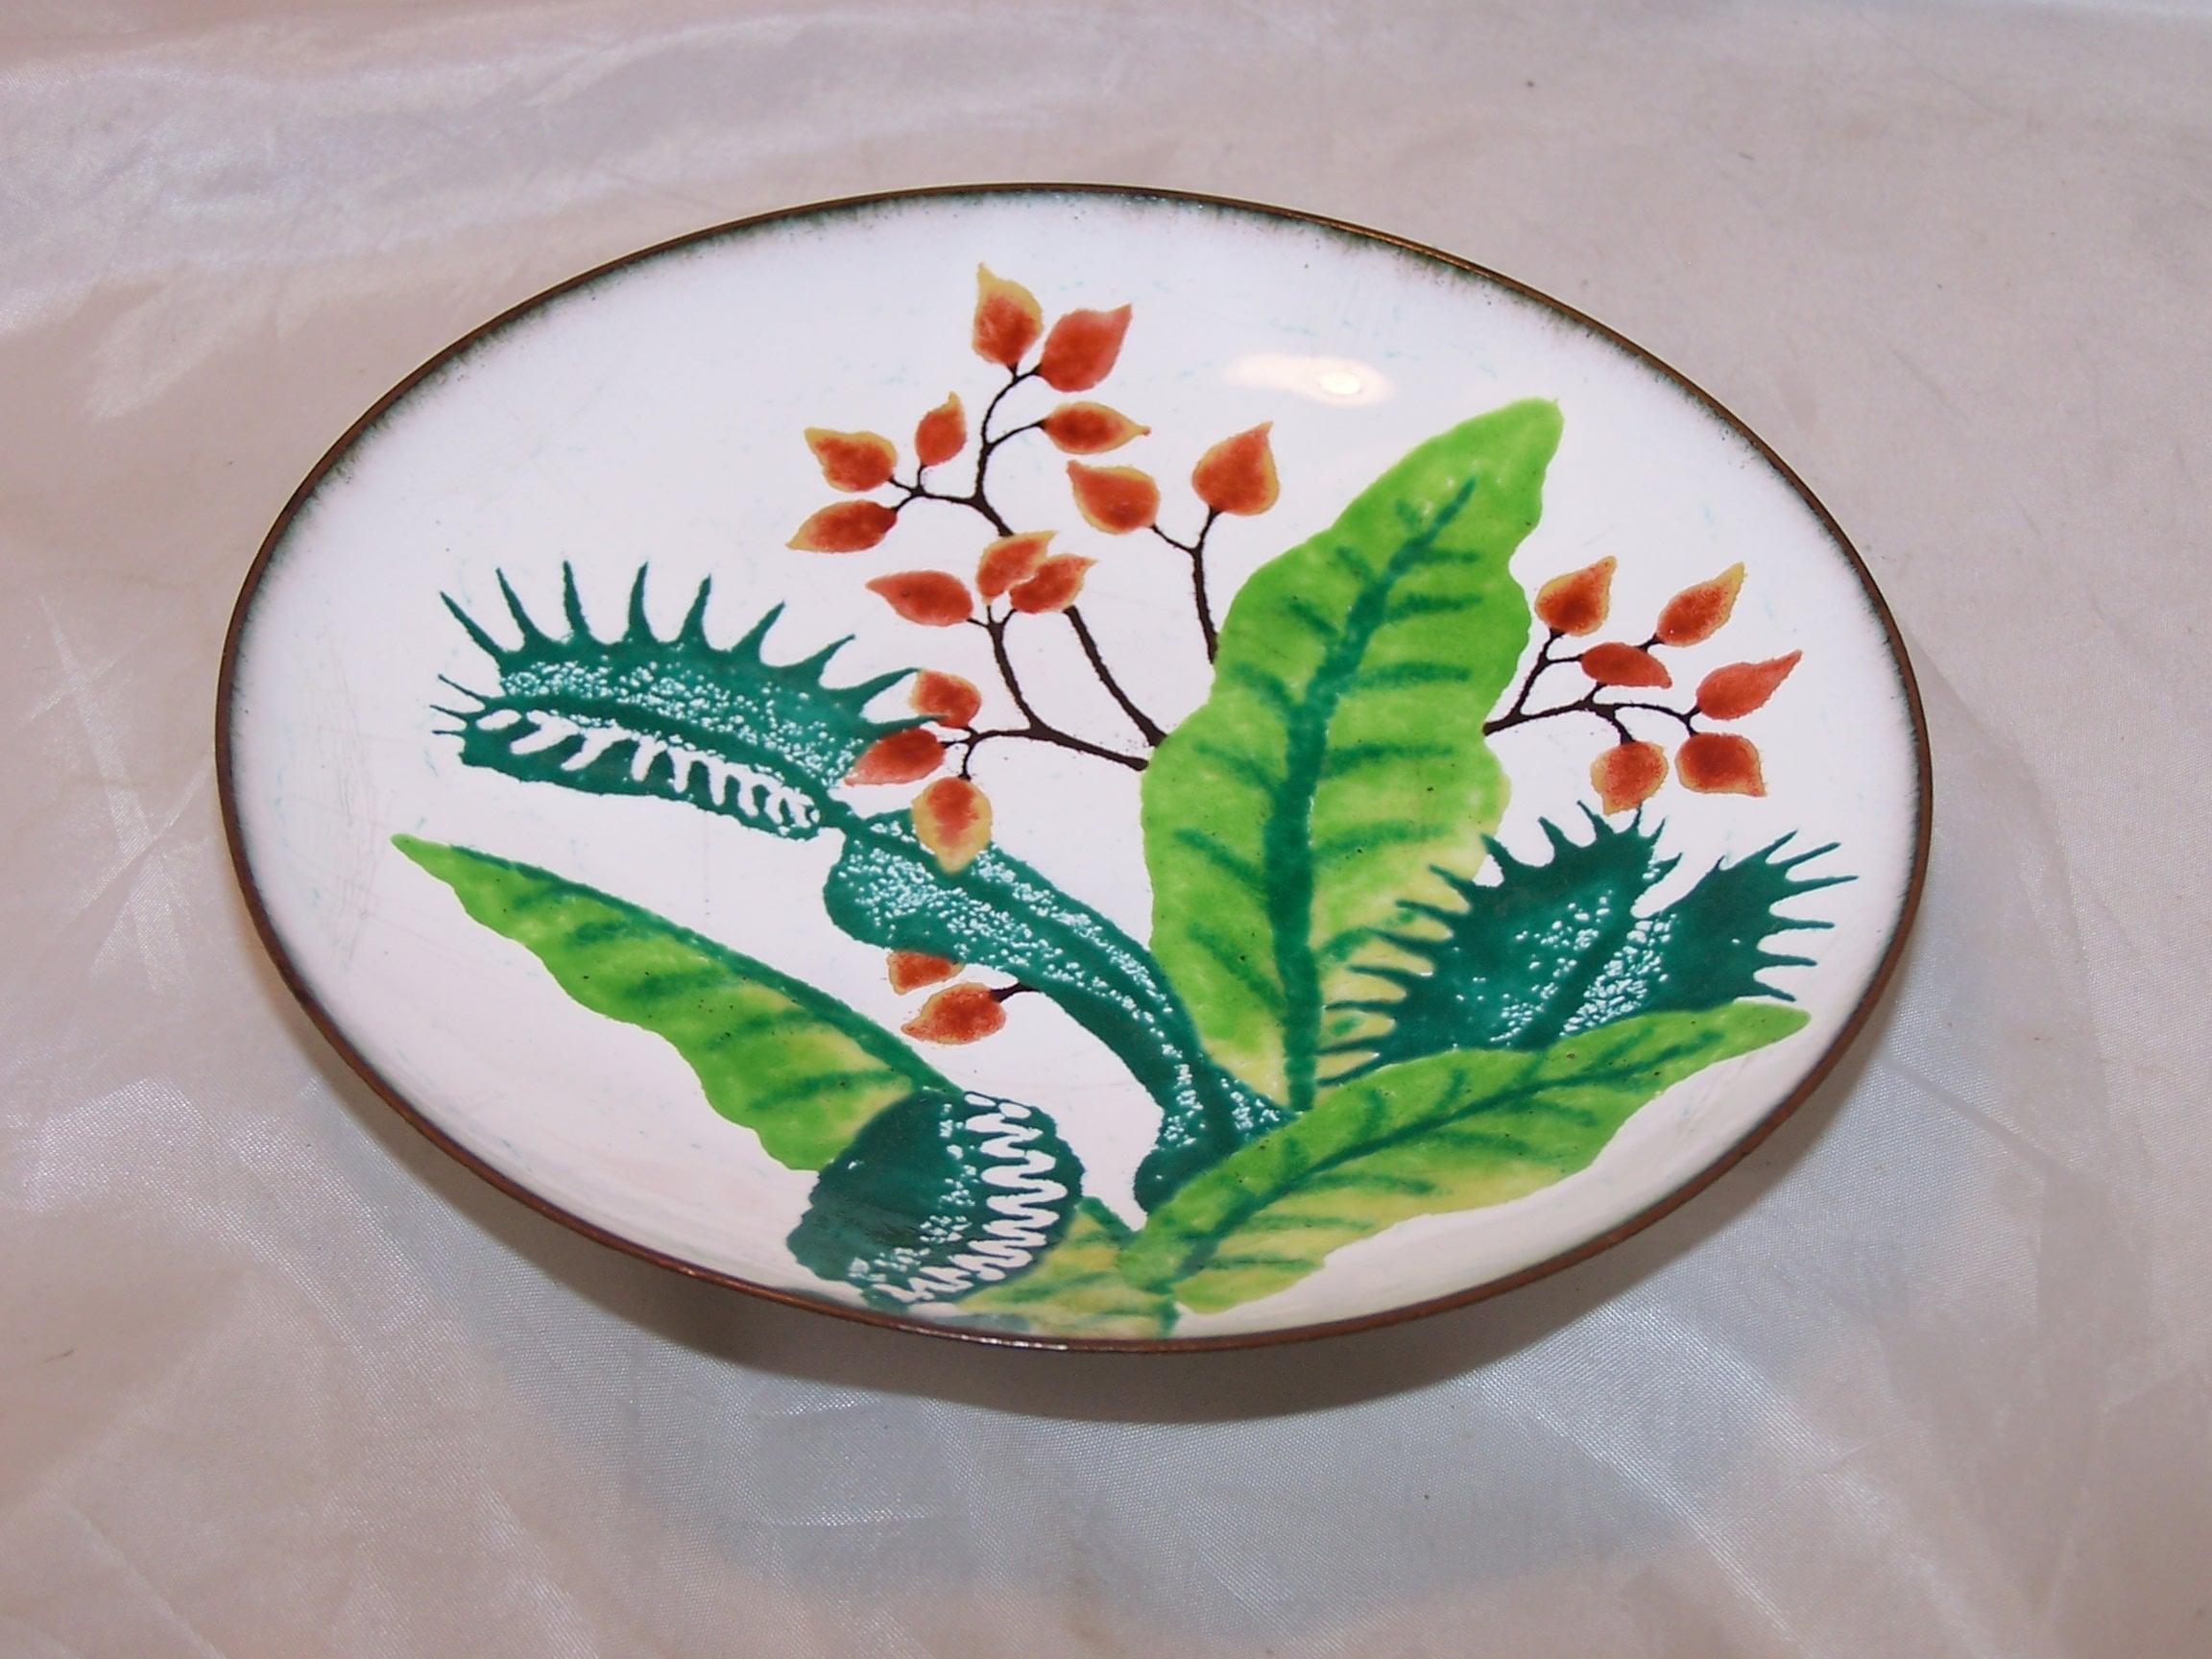 Marg Russell Venus Flytrap Enamel Copper Bowl, Artist Signed